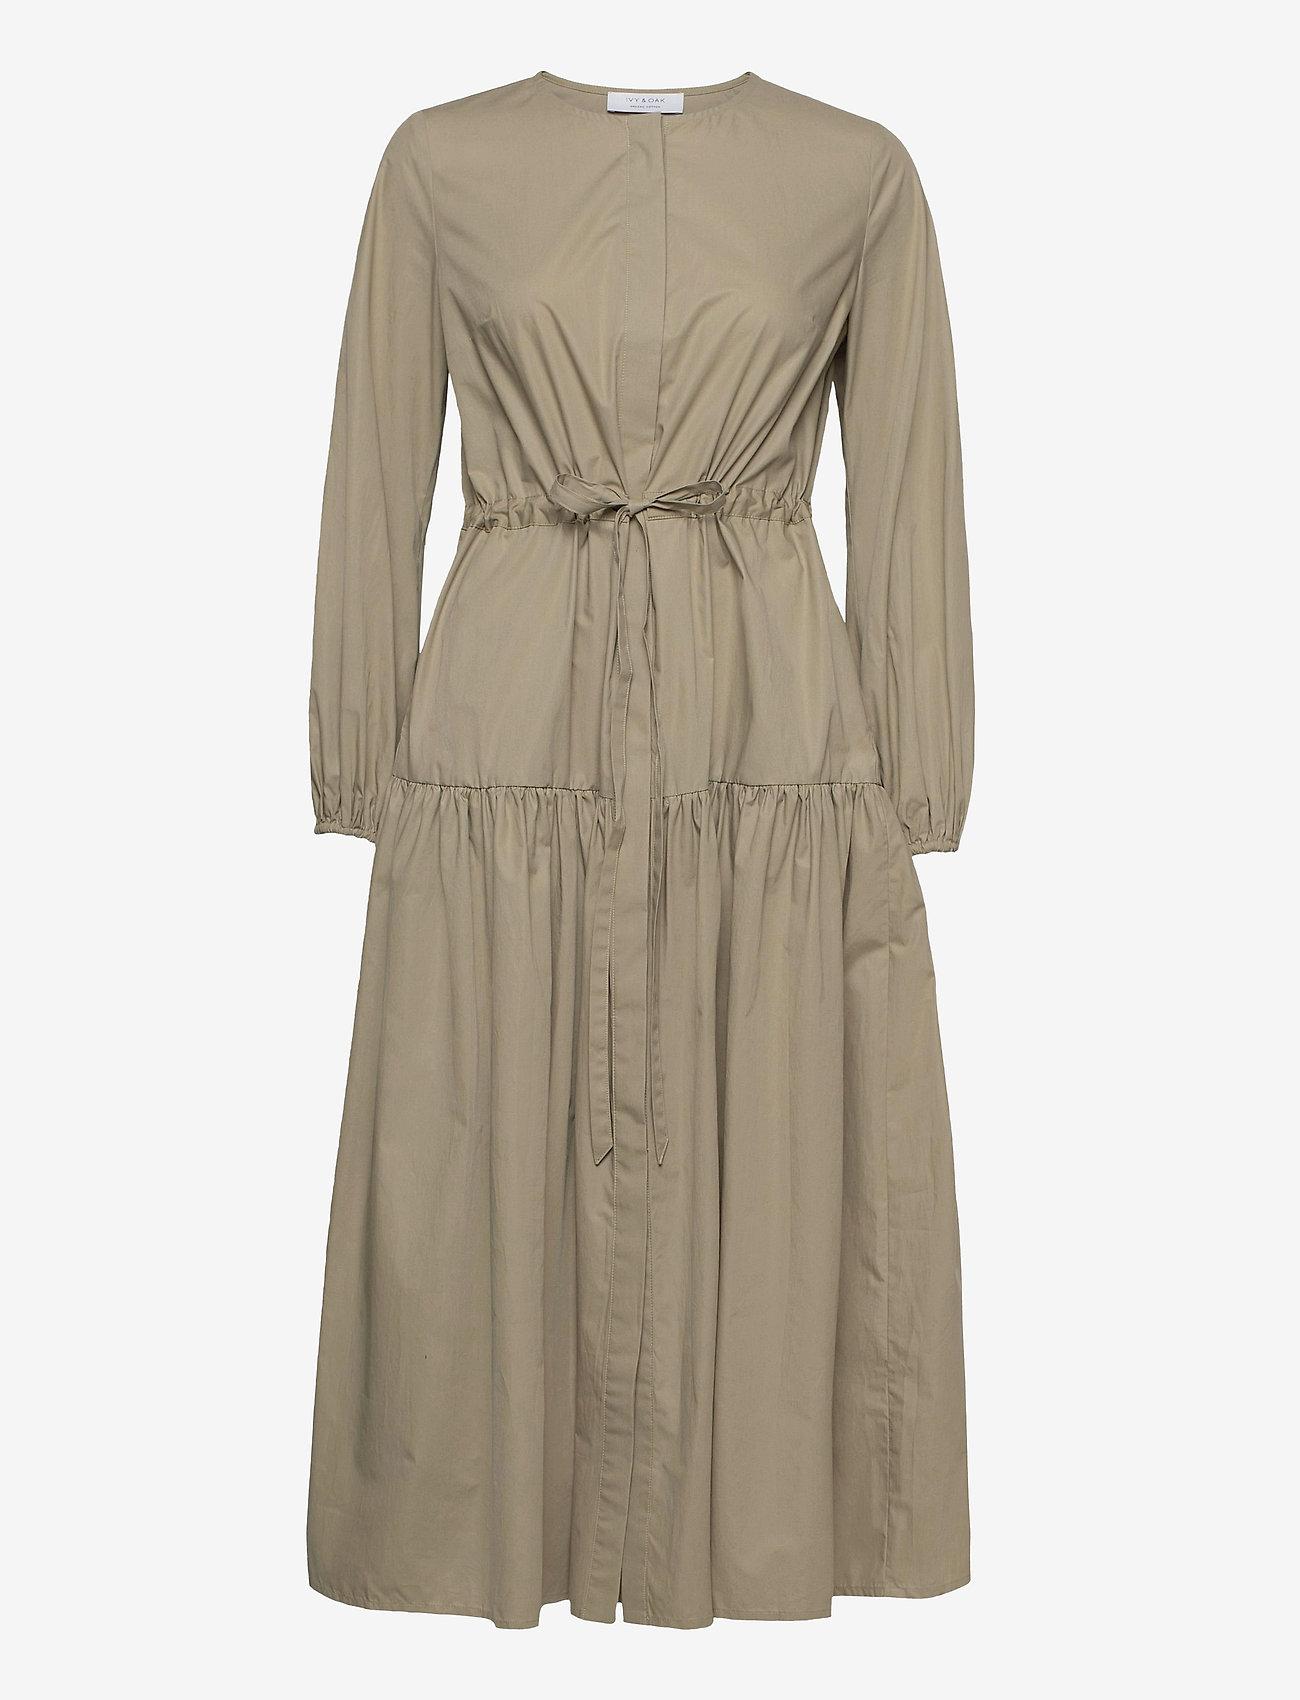 Ivy & Oak - CORDED SHIRT DRESS MIDI LENGHT - summer dresses - sage green - 0